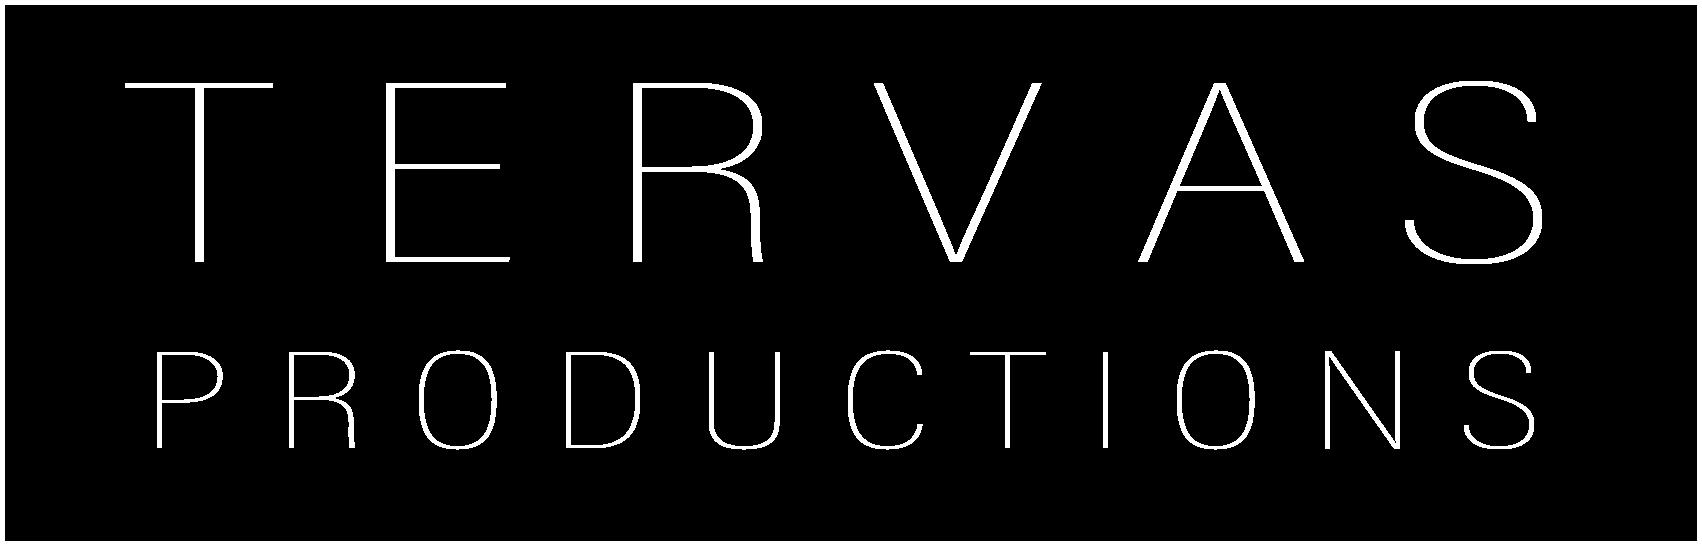 tervas productions logo